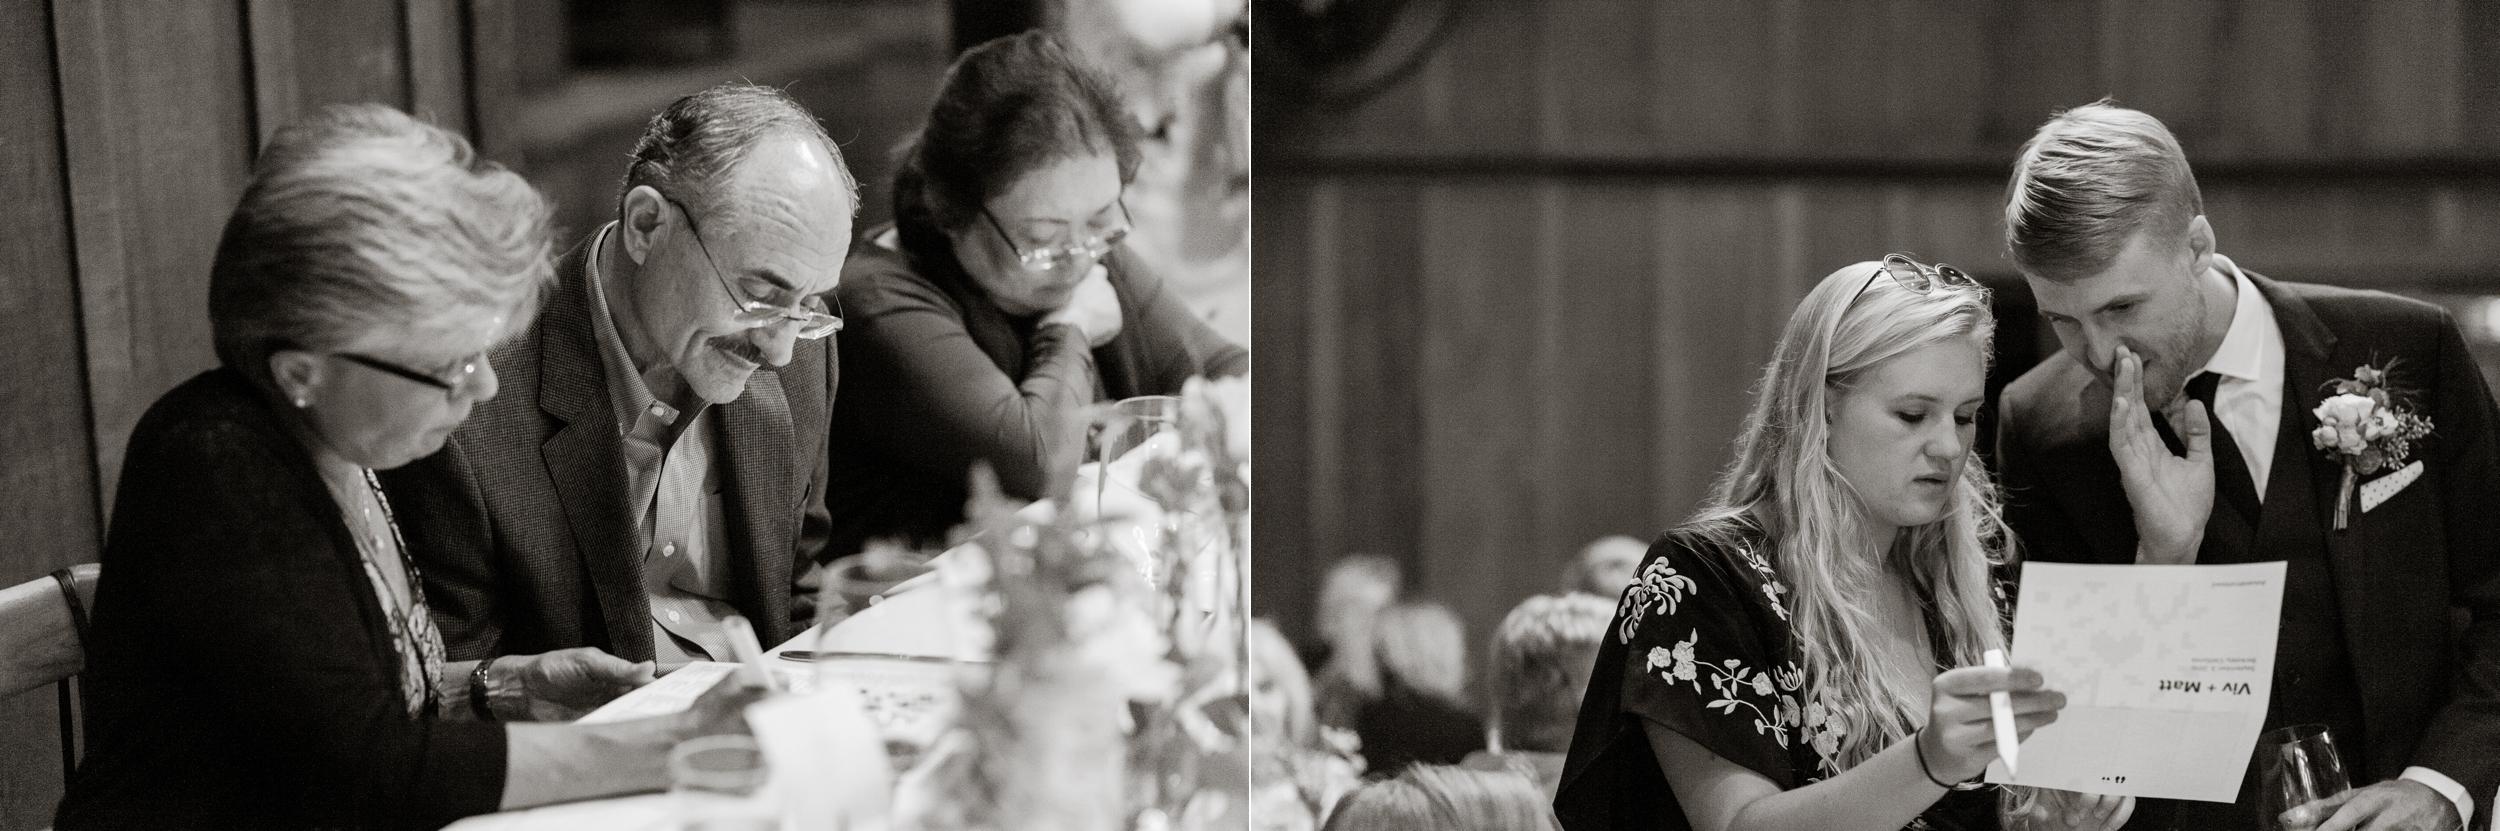 faculty-club-berkeley-wedding-photographer-vc077.jpg